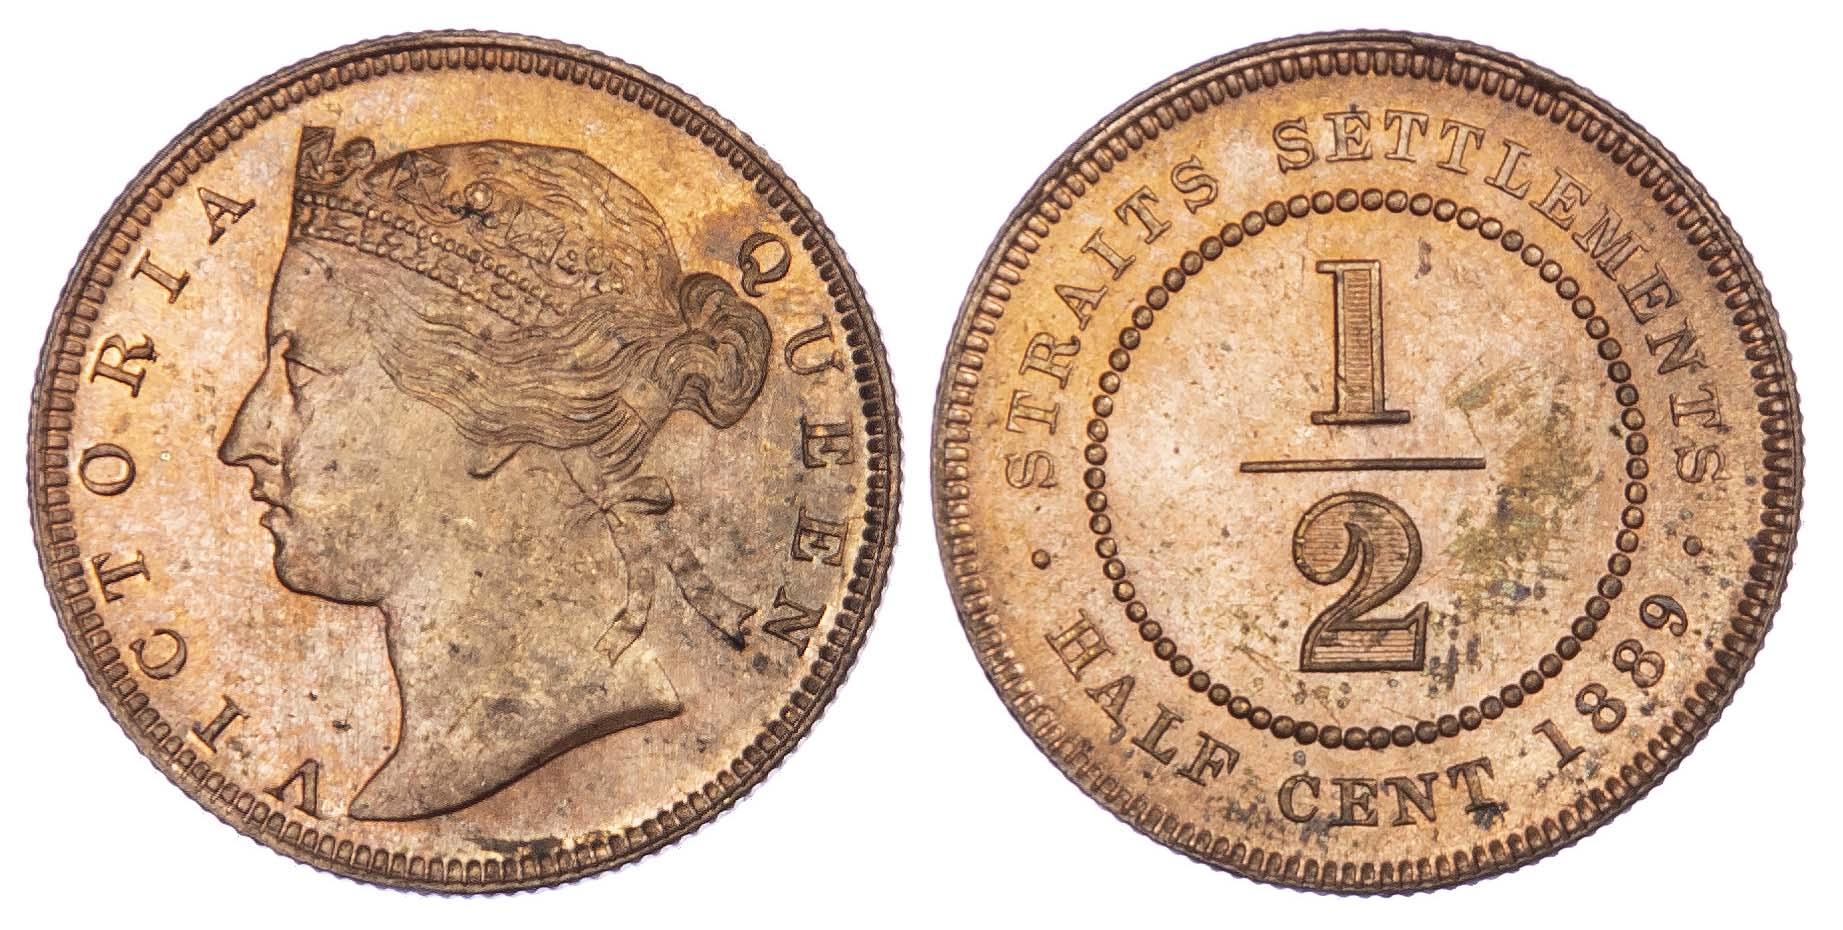 Straits Settlements, Victoria (1837-1901), copper Half Cent, 1889